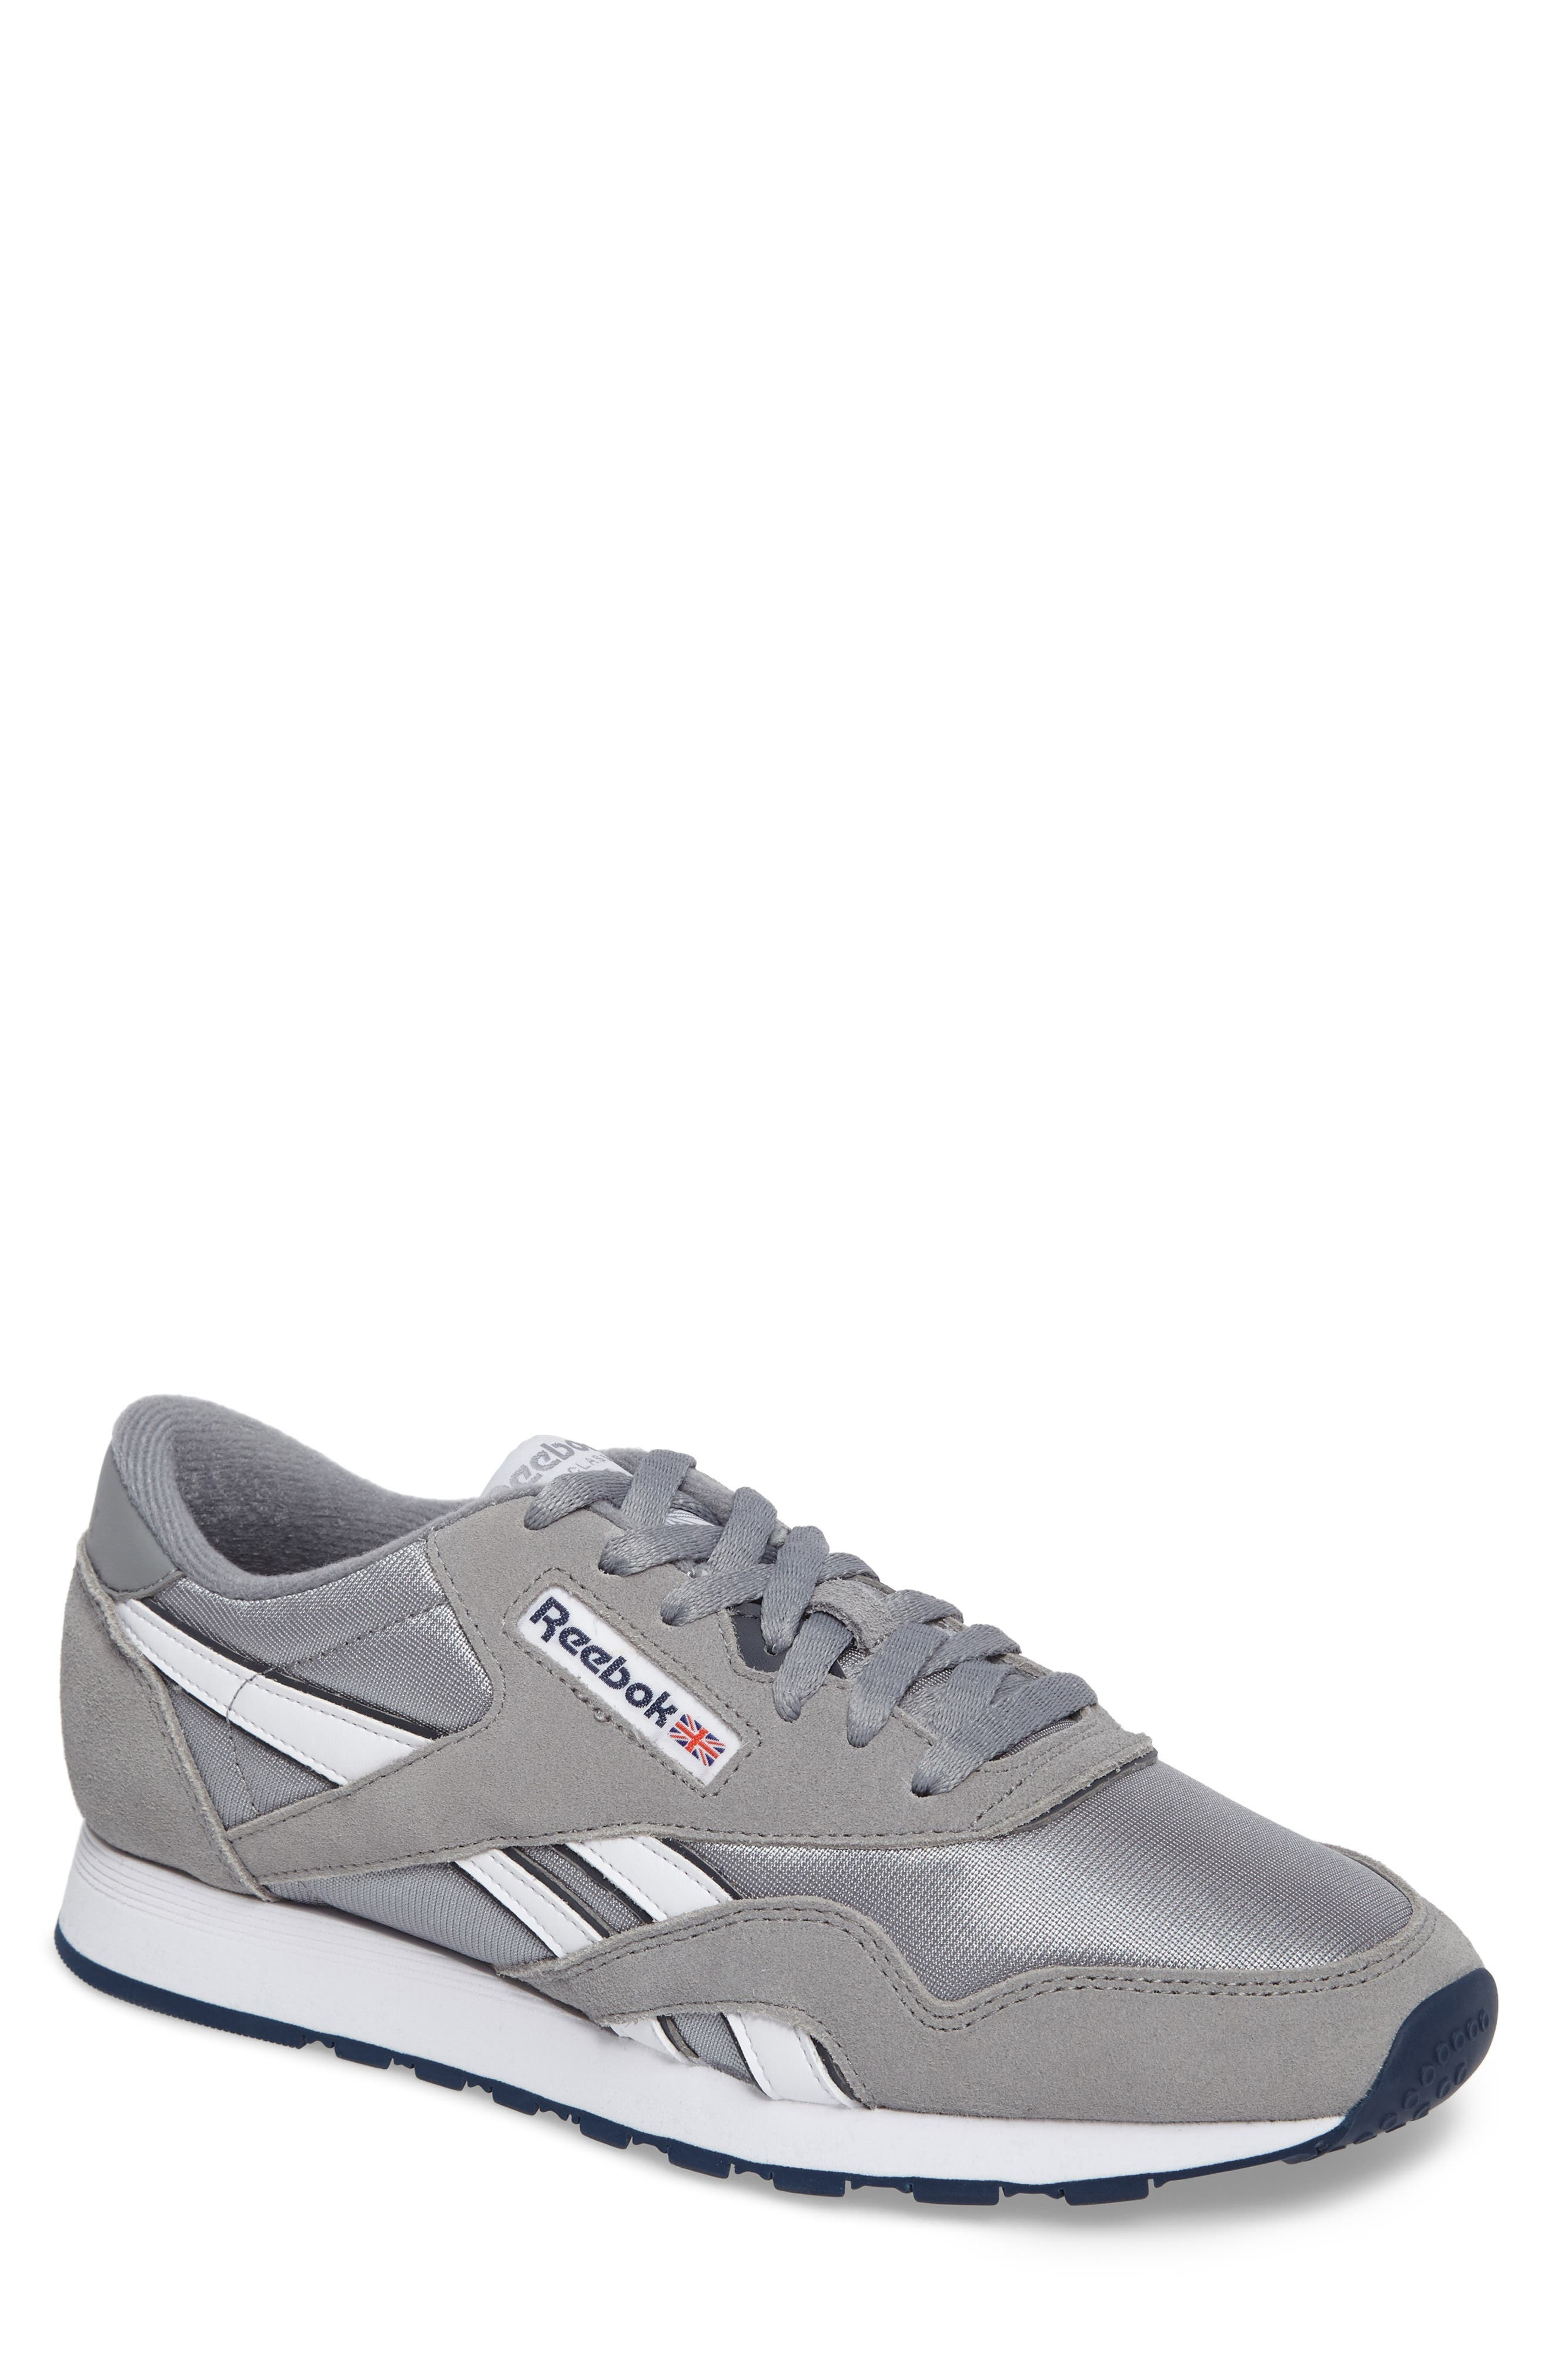 Alternate Image 1 Selected - Reebok Classic Nylon Sneaker (Men)